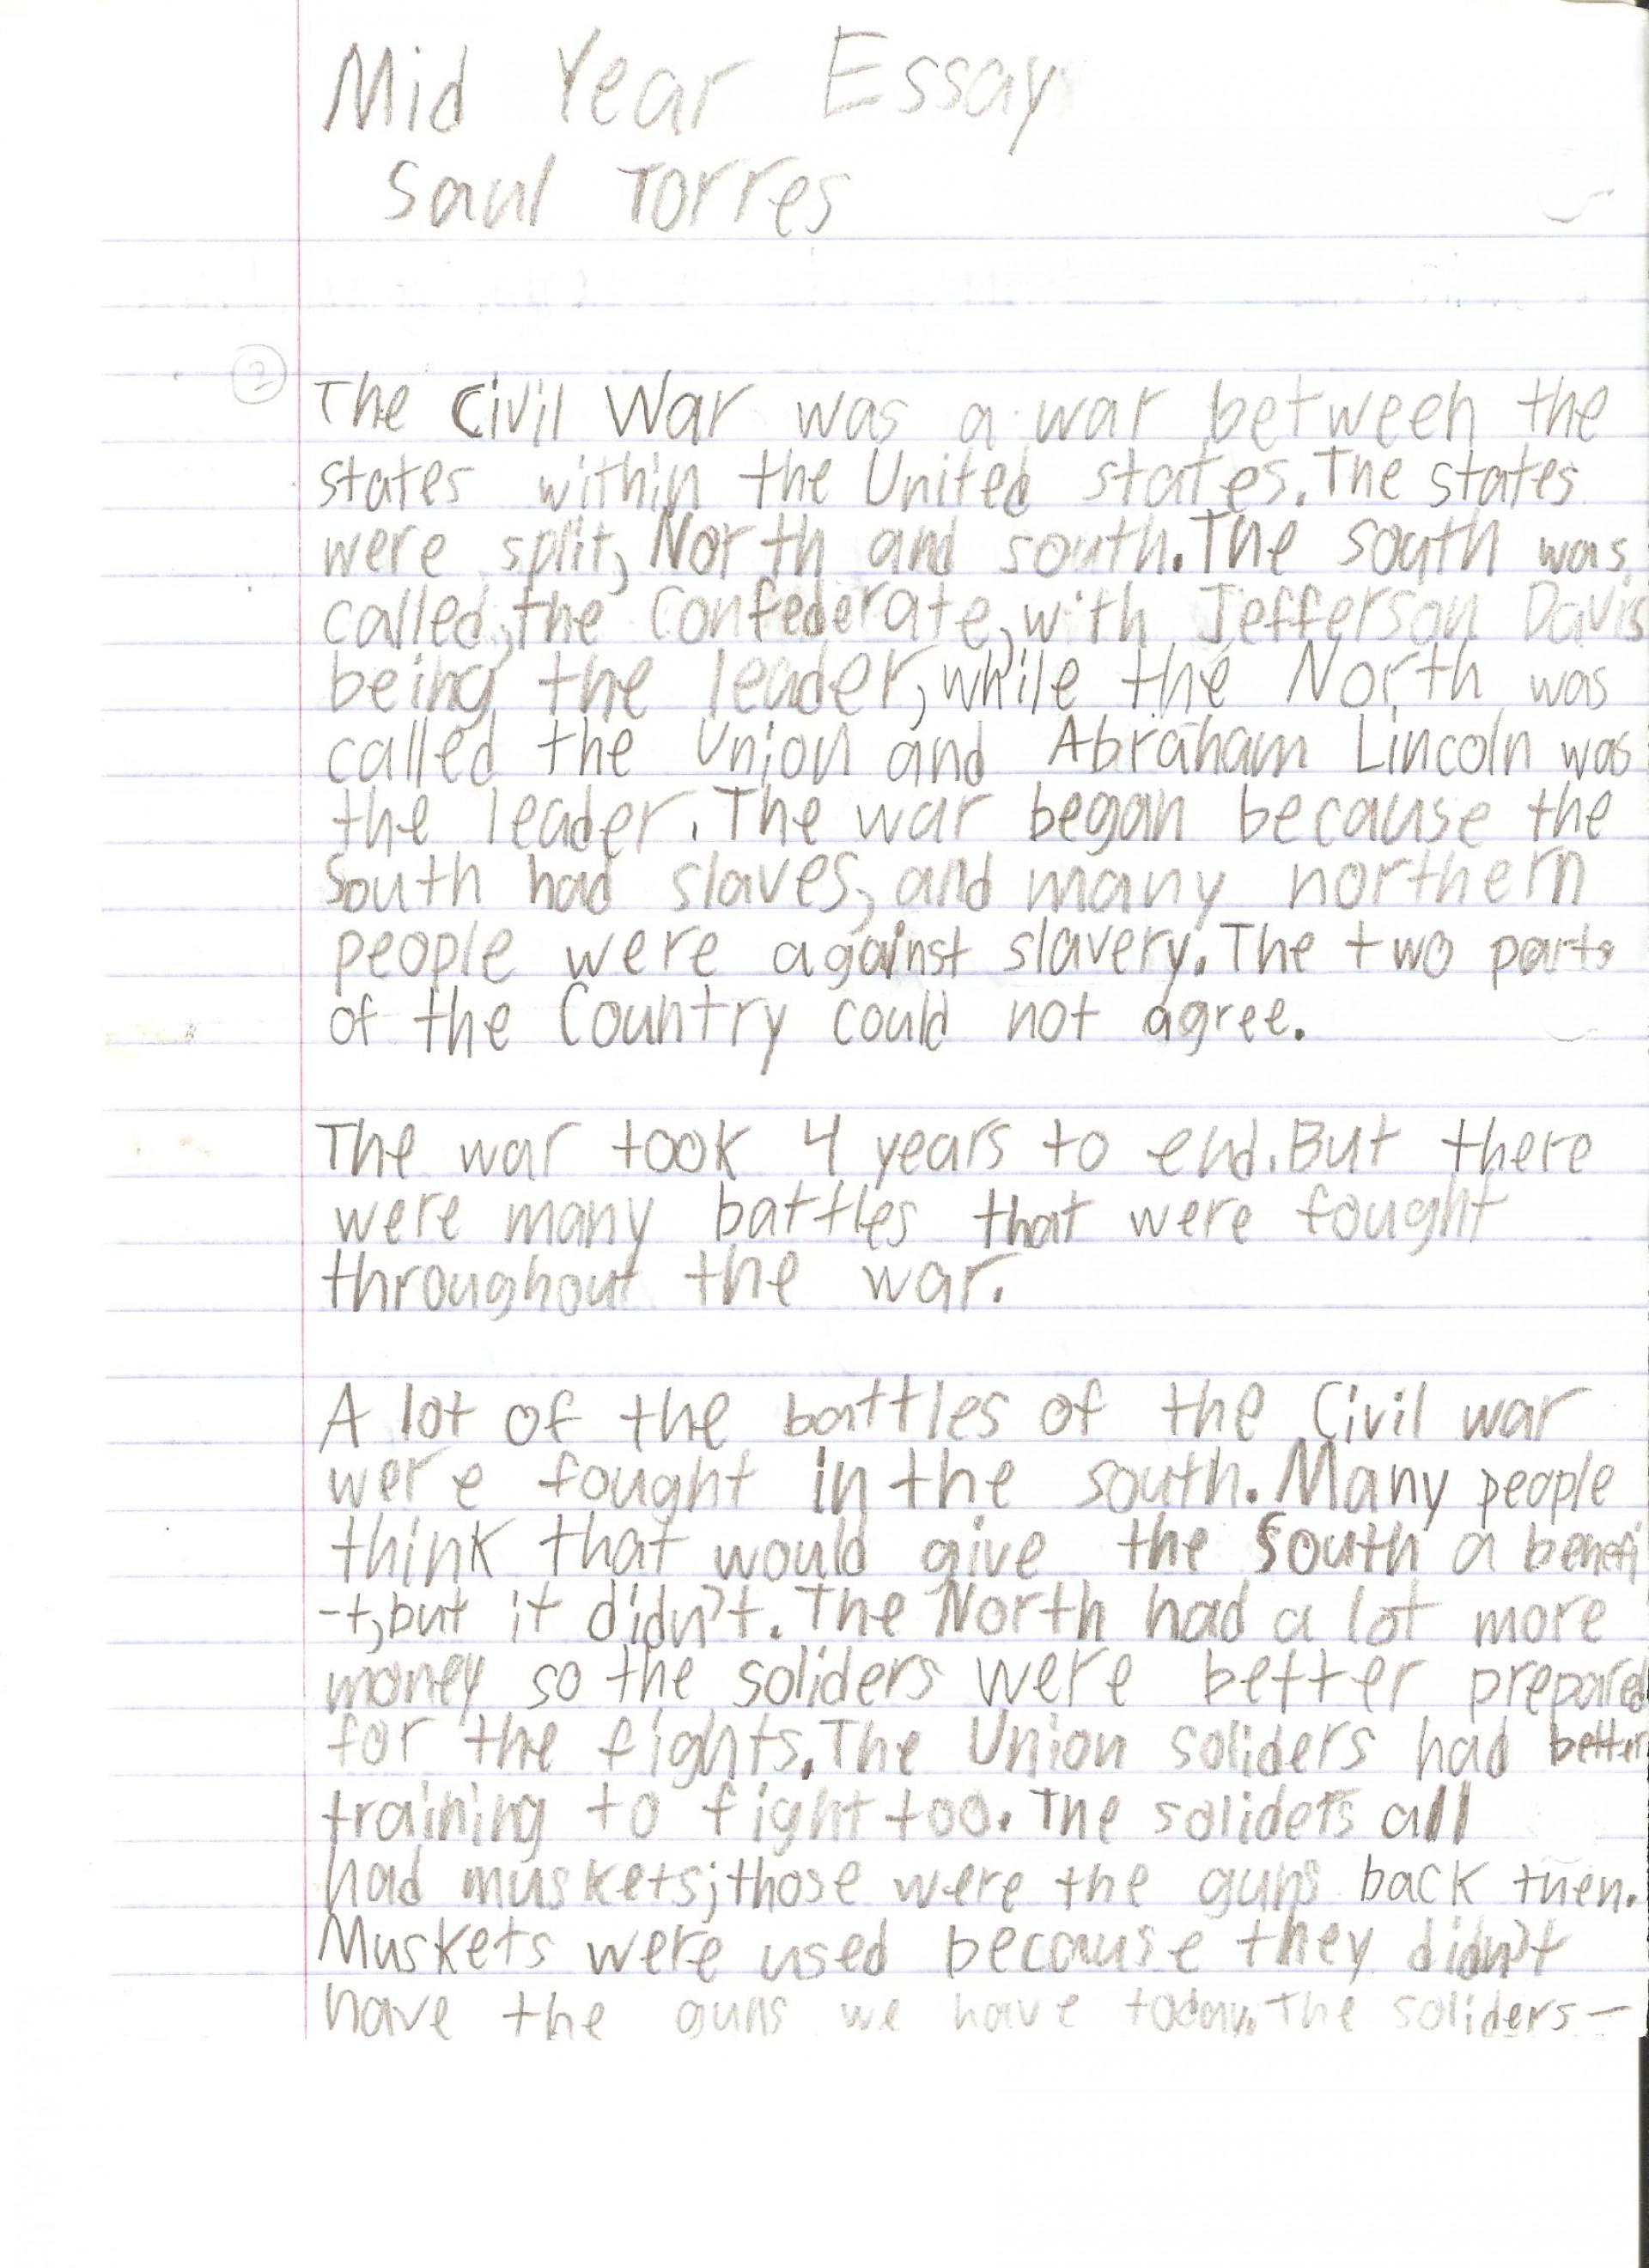 006 Saul Torres Essay Example 6th Grade Fantastic Examples Informative Personal 1920